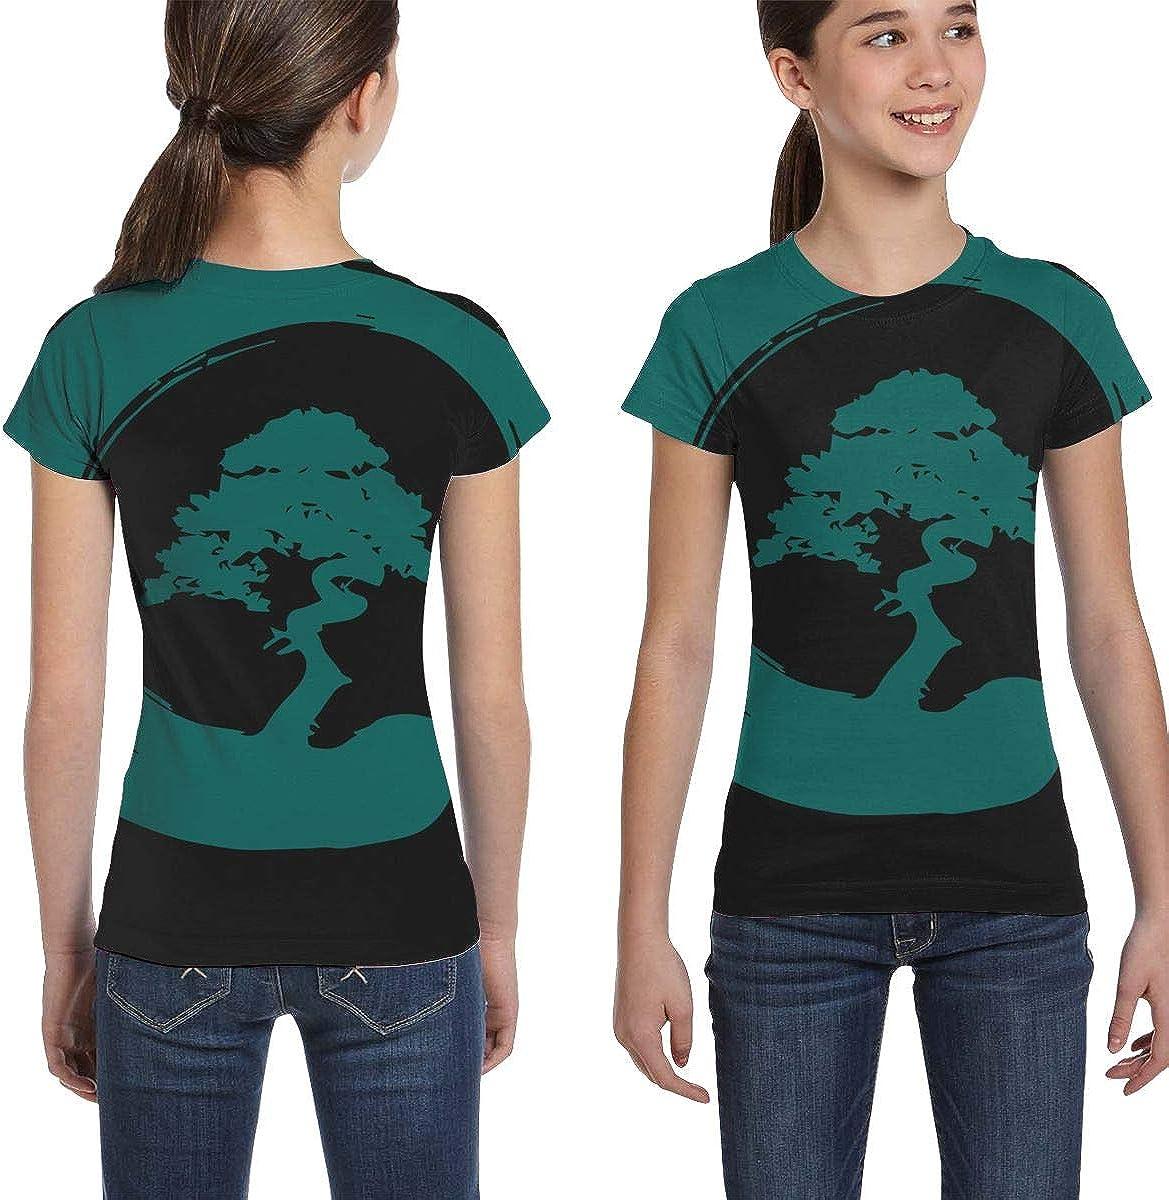 L6Nv4o@A Girls Short Sleeve Bonsai Tree Shirts Fashion Tunic Shirt Dress XS-XL